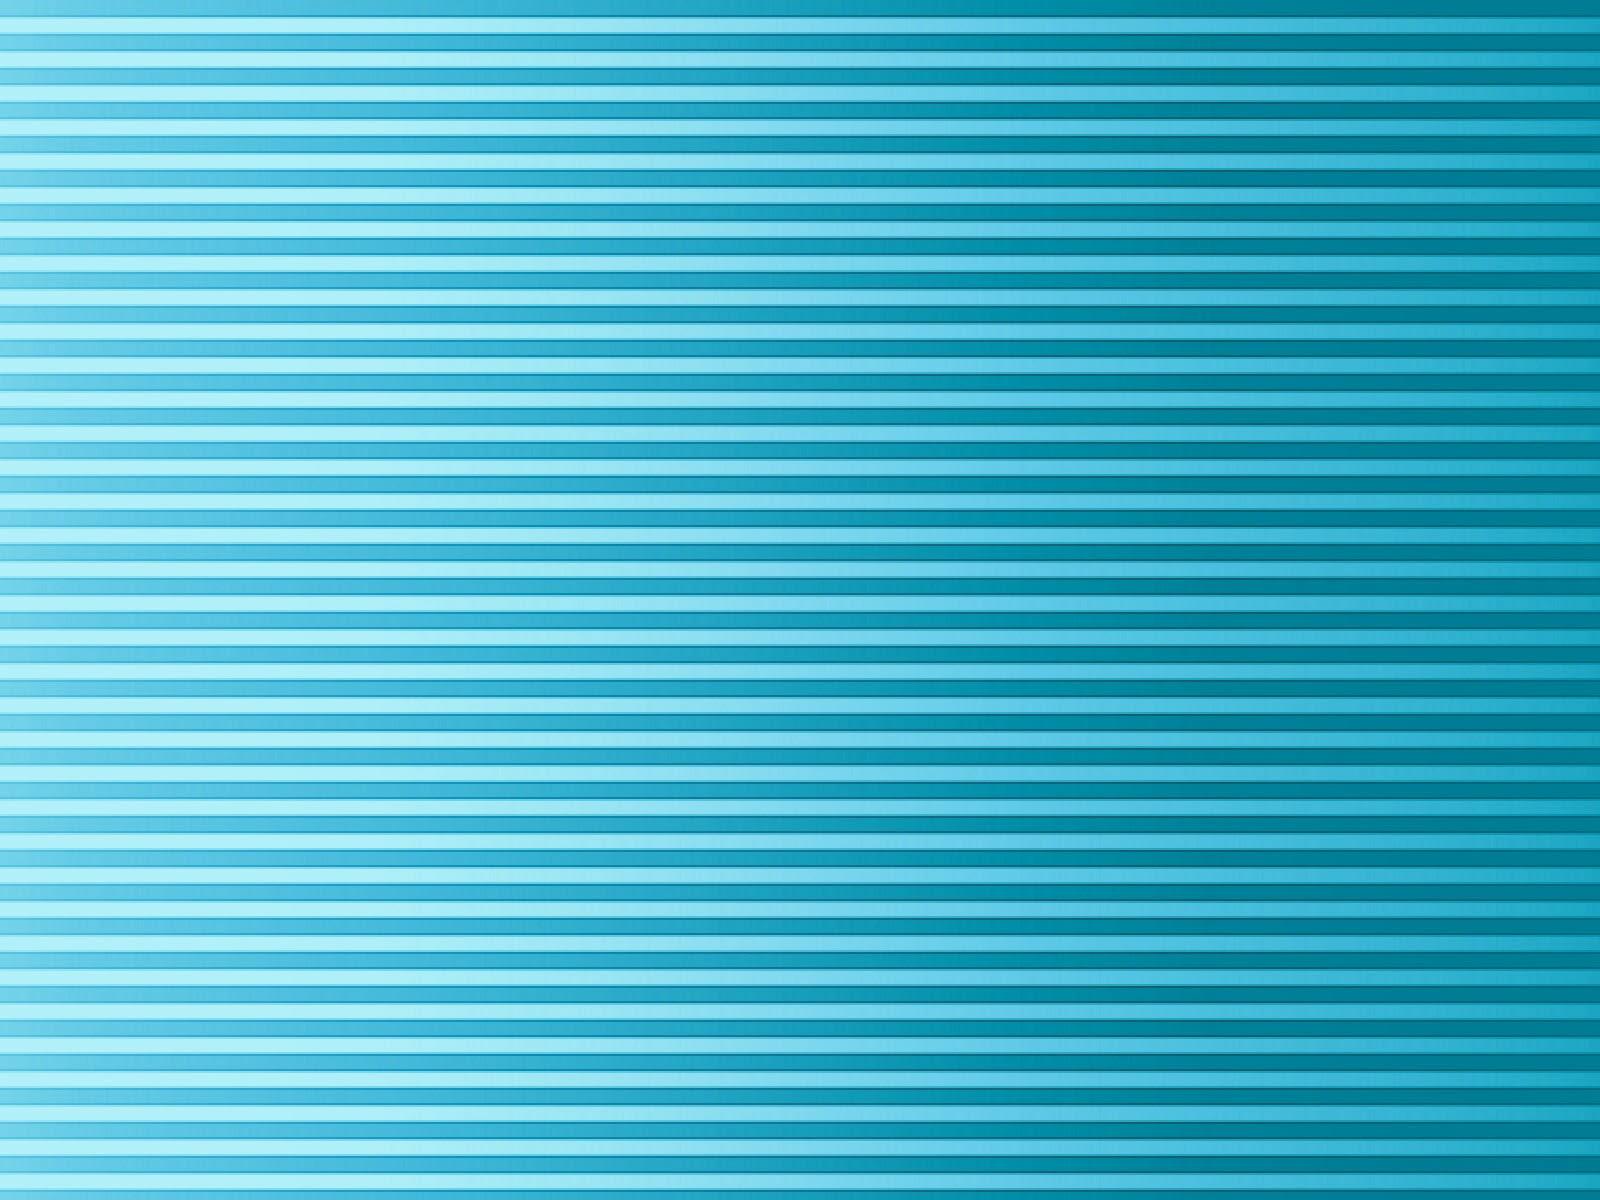 sh yn design stripe pattern wallpaper teal stripe. Black Bedroom Furniture Sets. Home Design Ideas